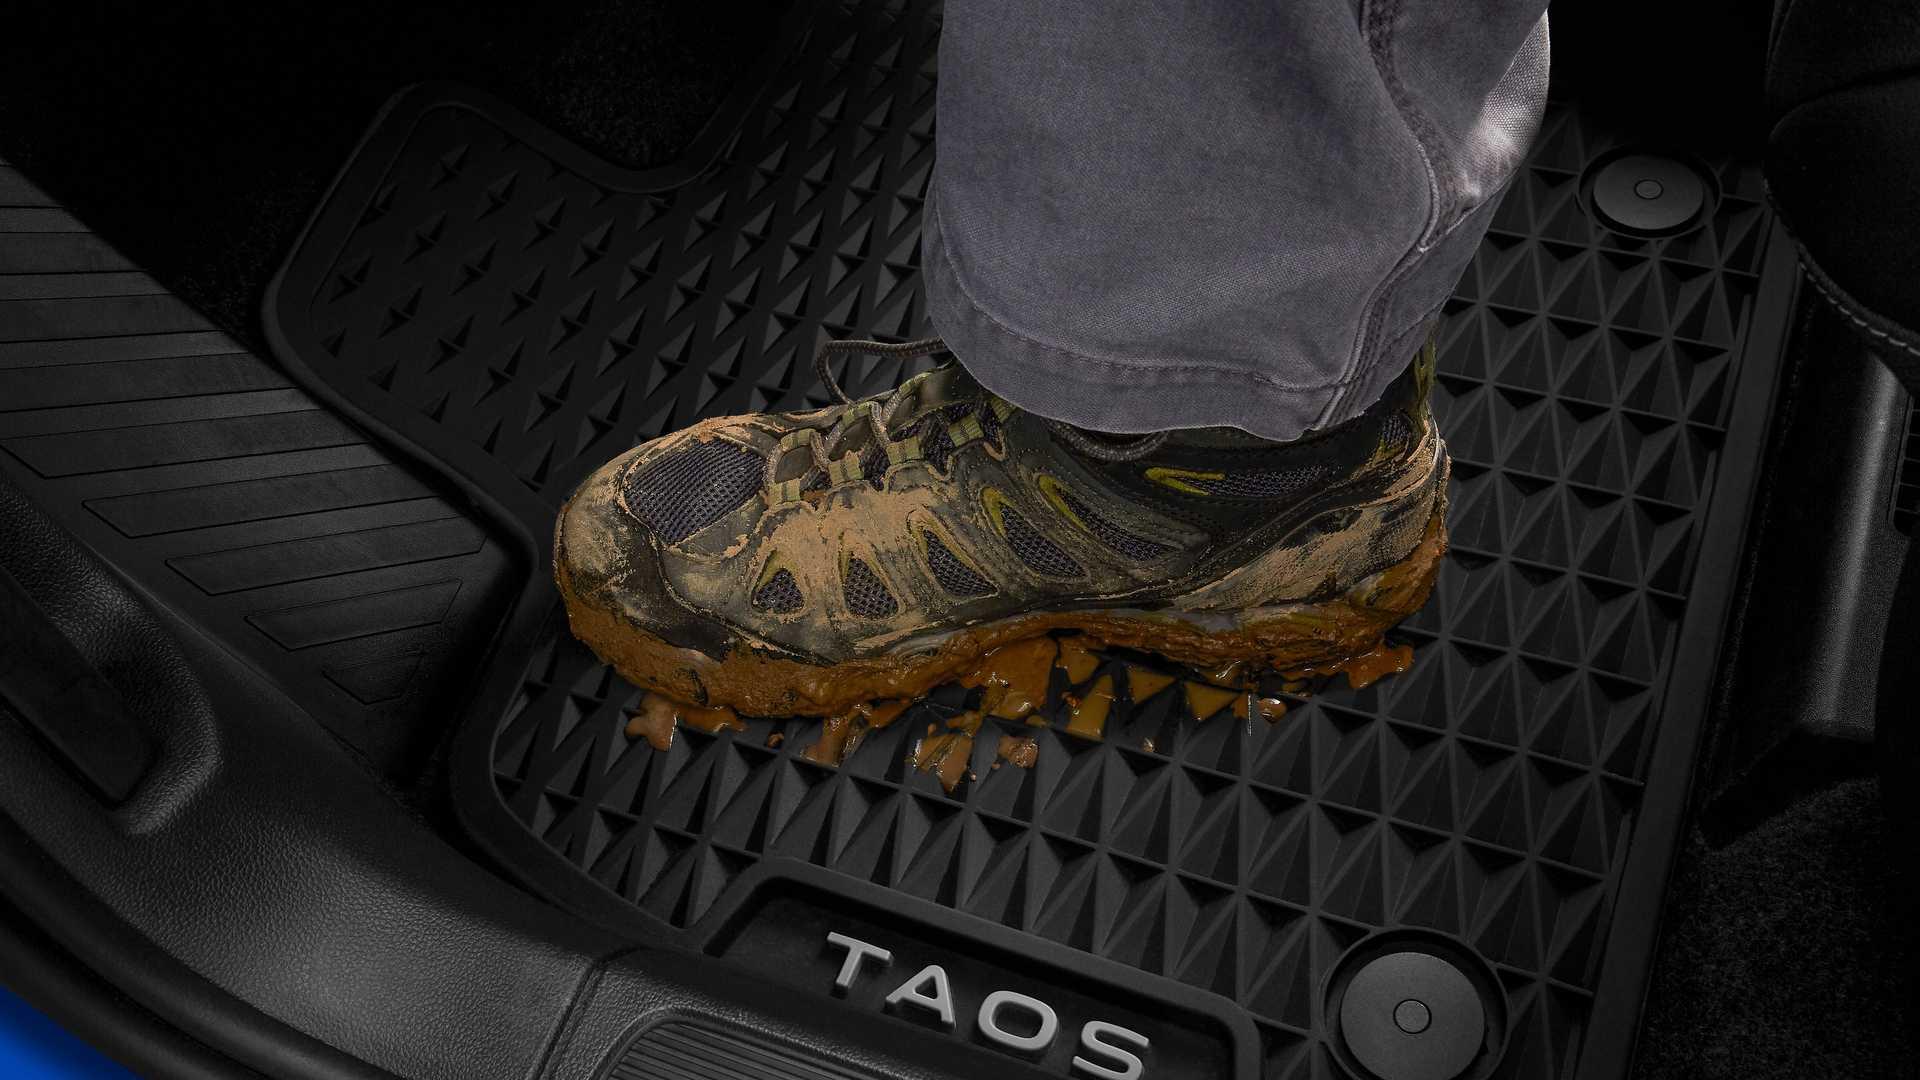 Volkswagen-Taos-Basecamp-8